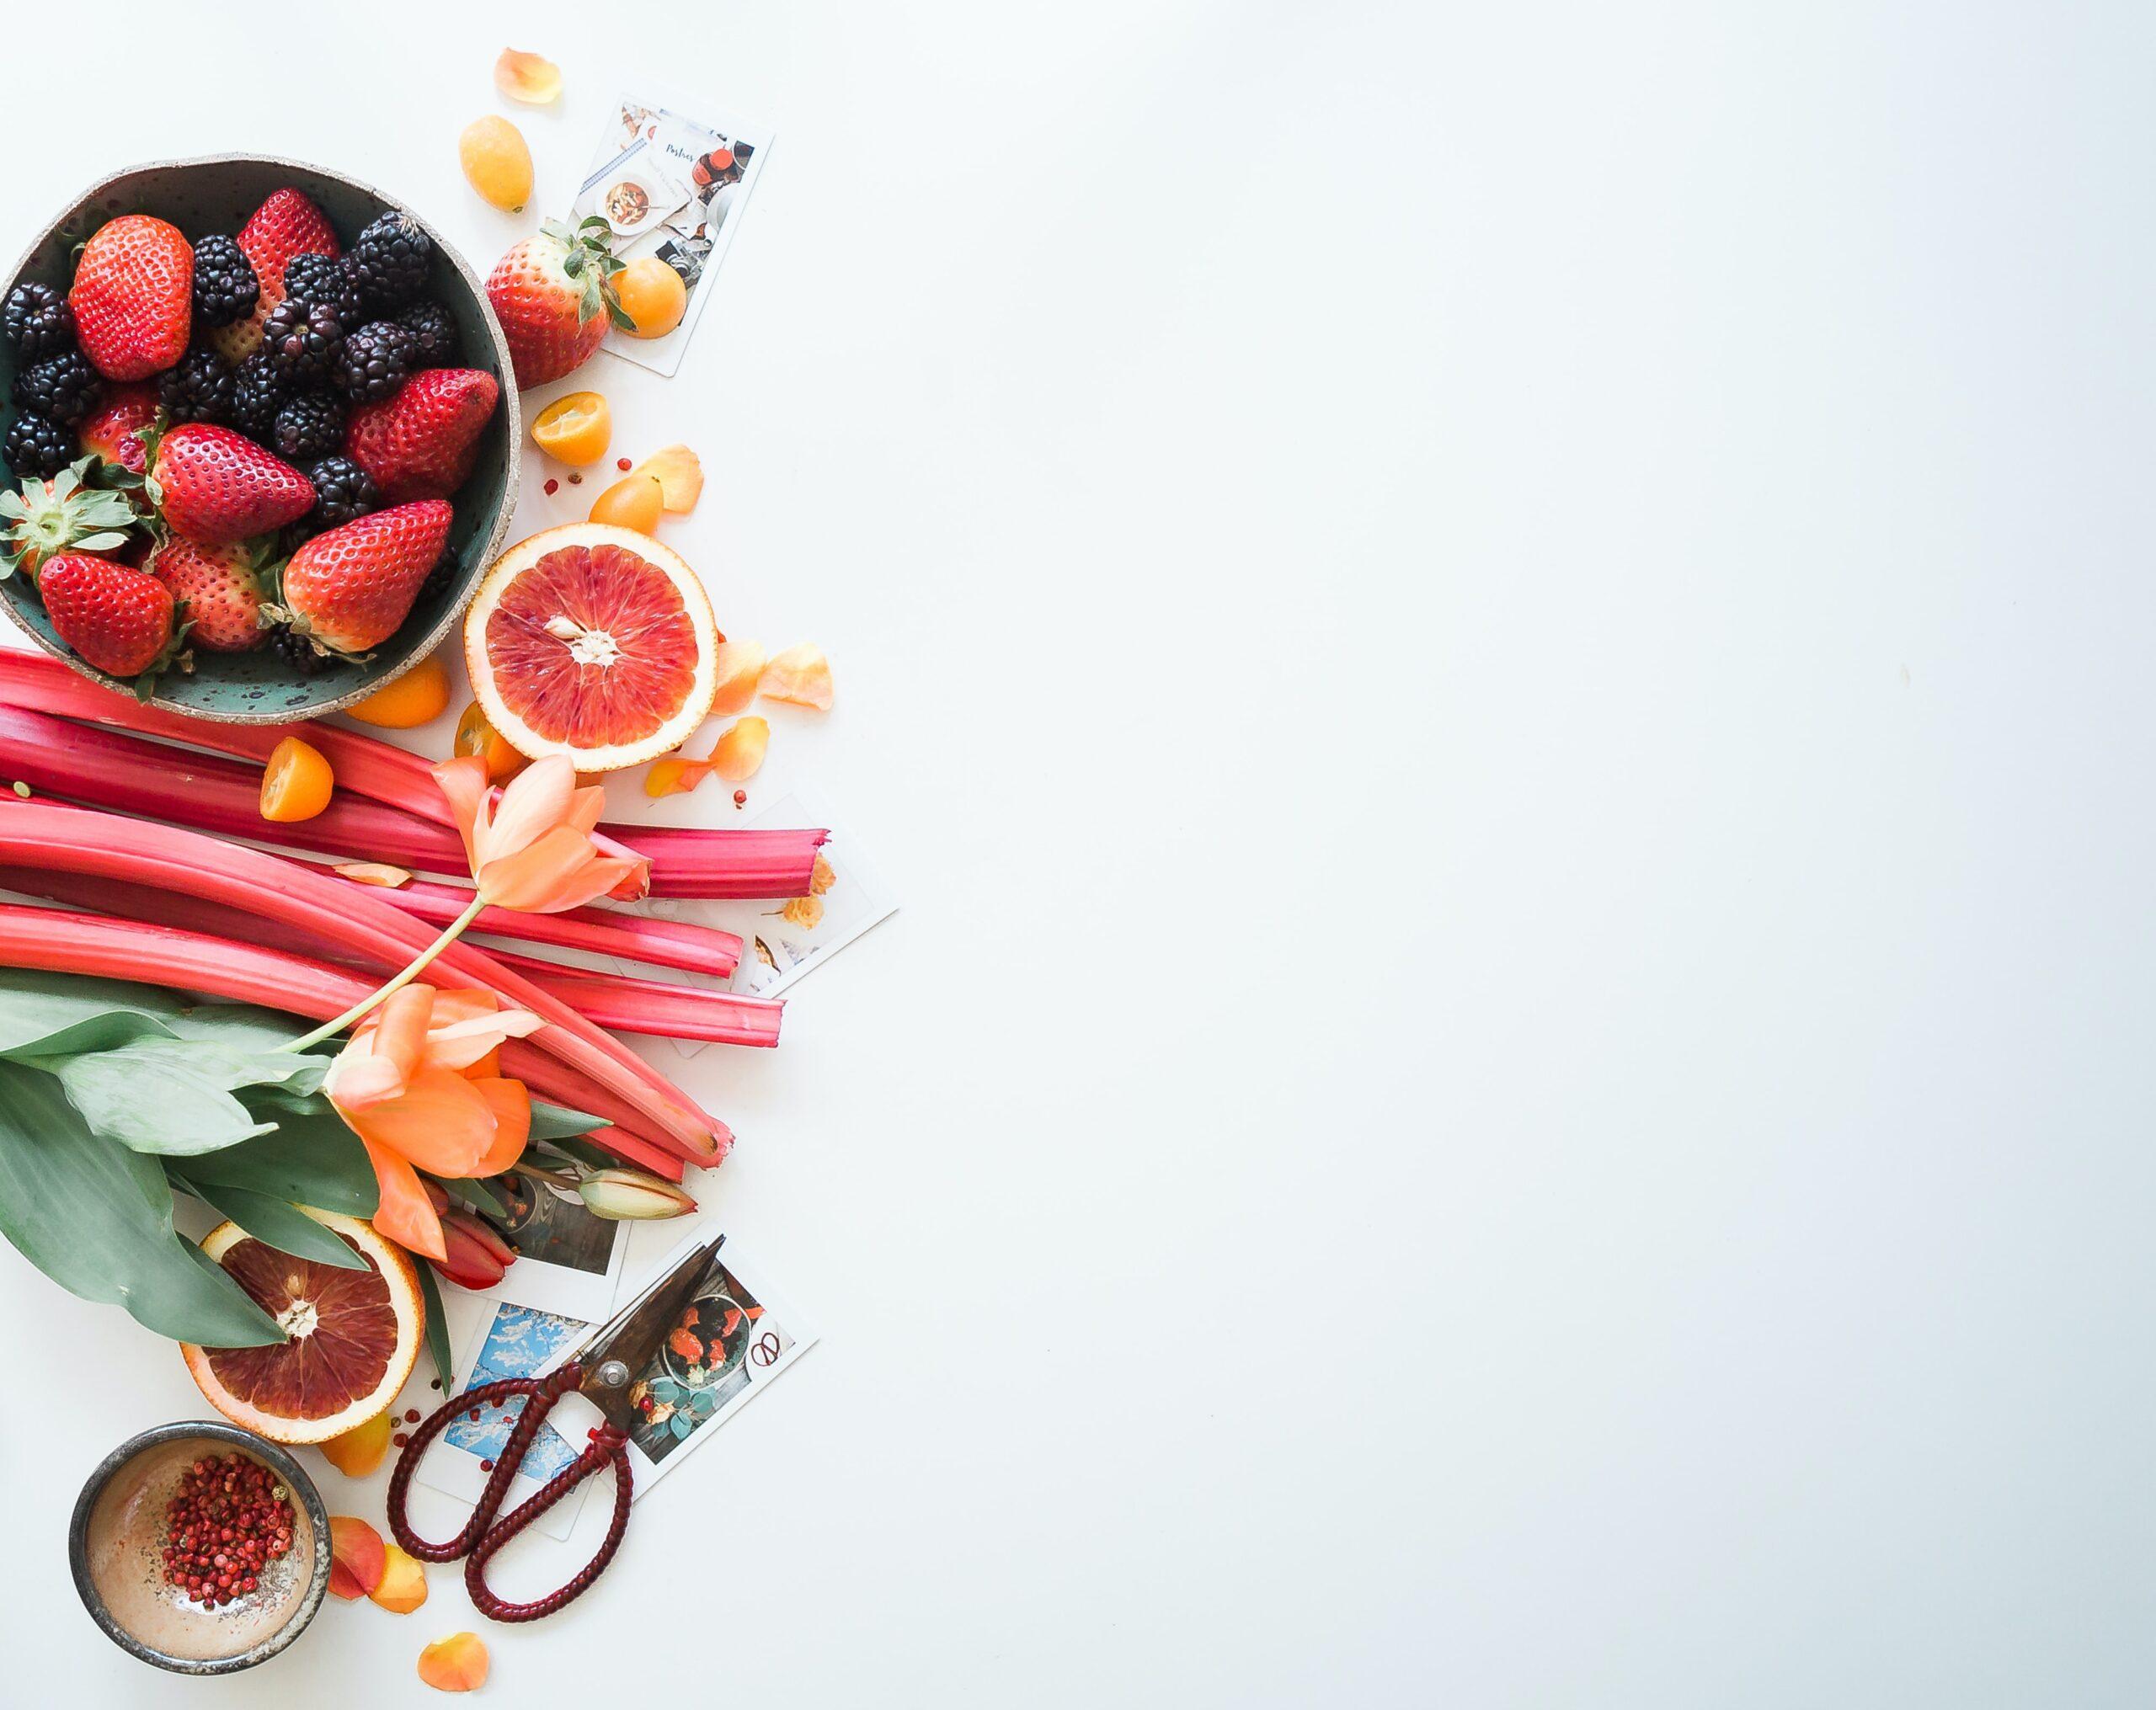 Fruits cut up